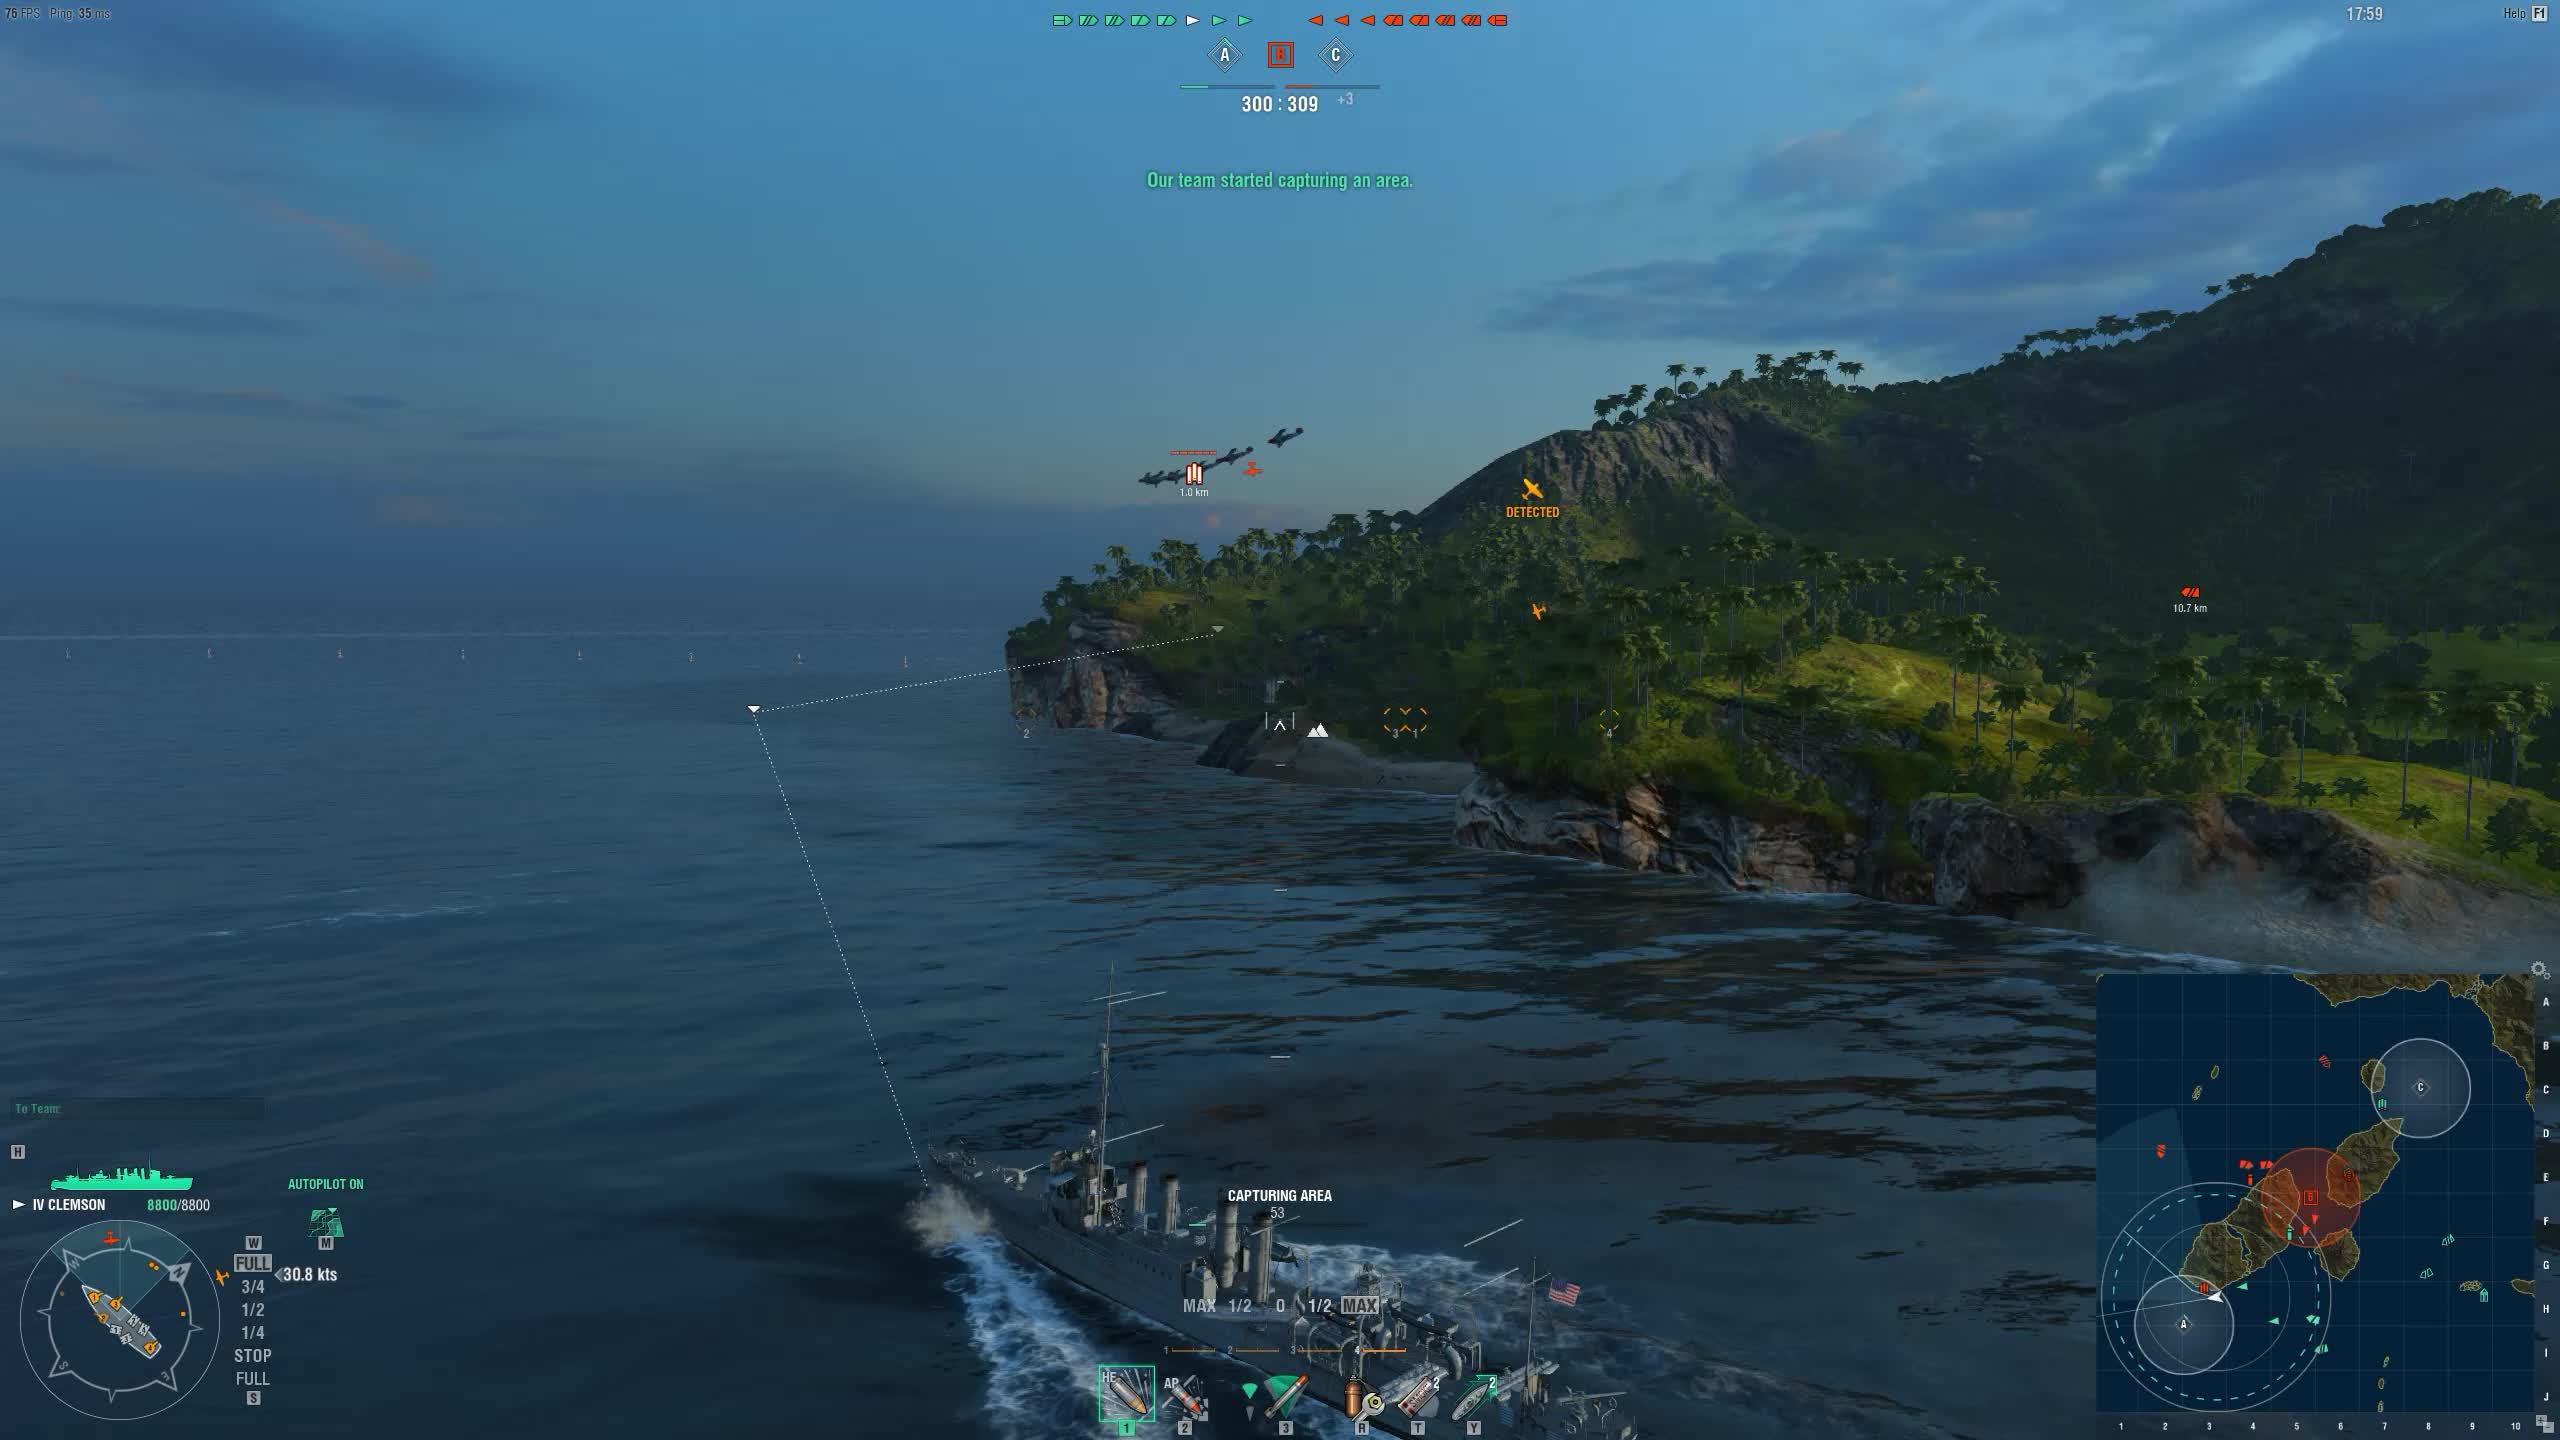 worldofwarships, vlc-record-2018-06-12-21h56m06s-World of Warships 2018.06.12 - 21.52.43.03.DVR.mp4- GIFs